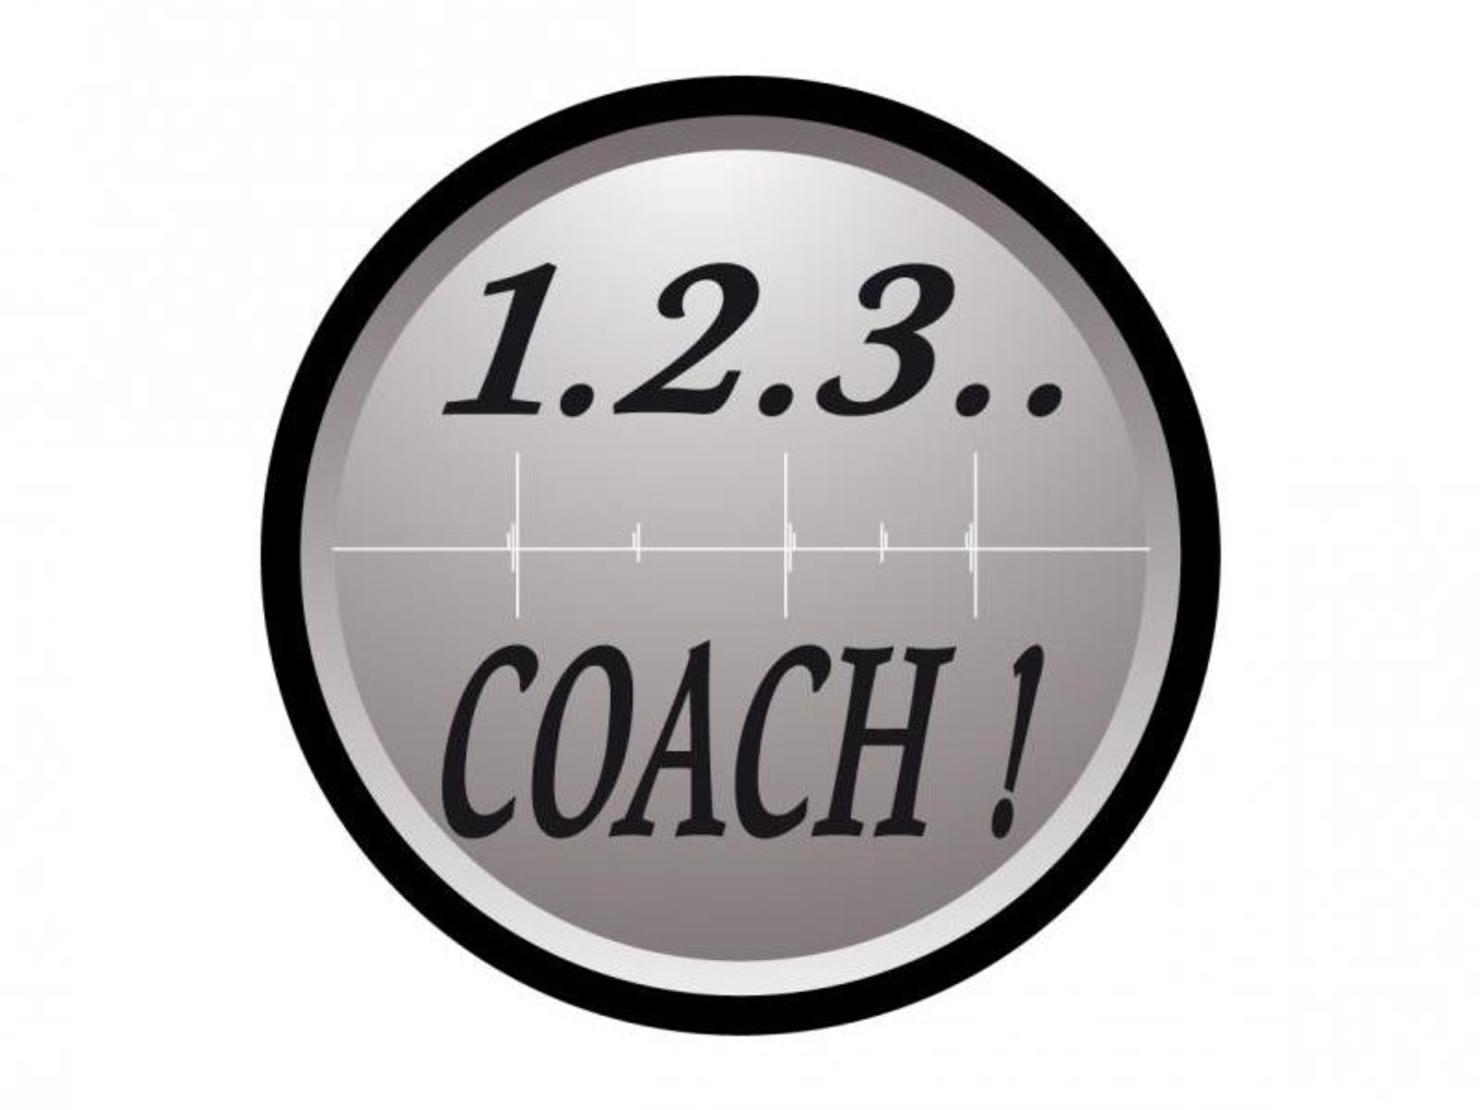 1.2.3... Coach Gif